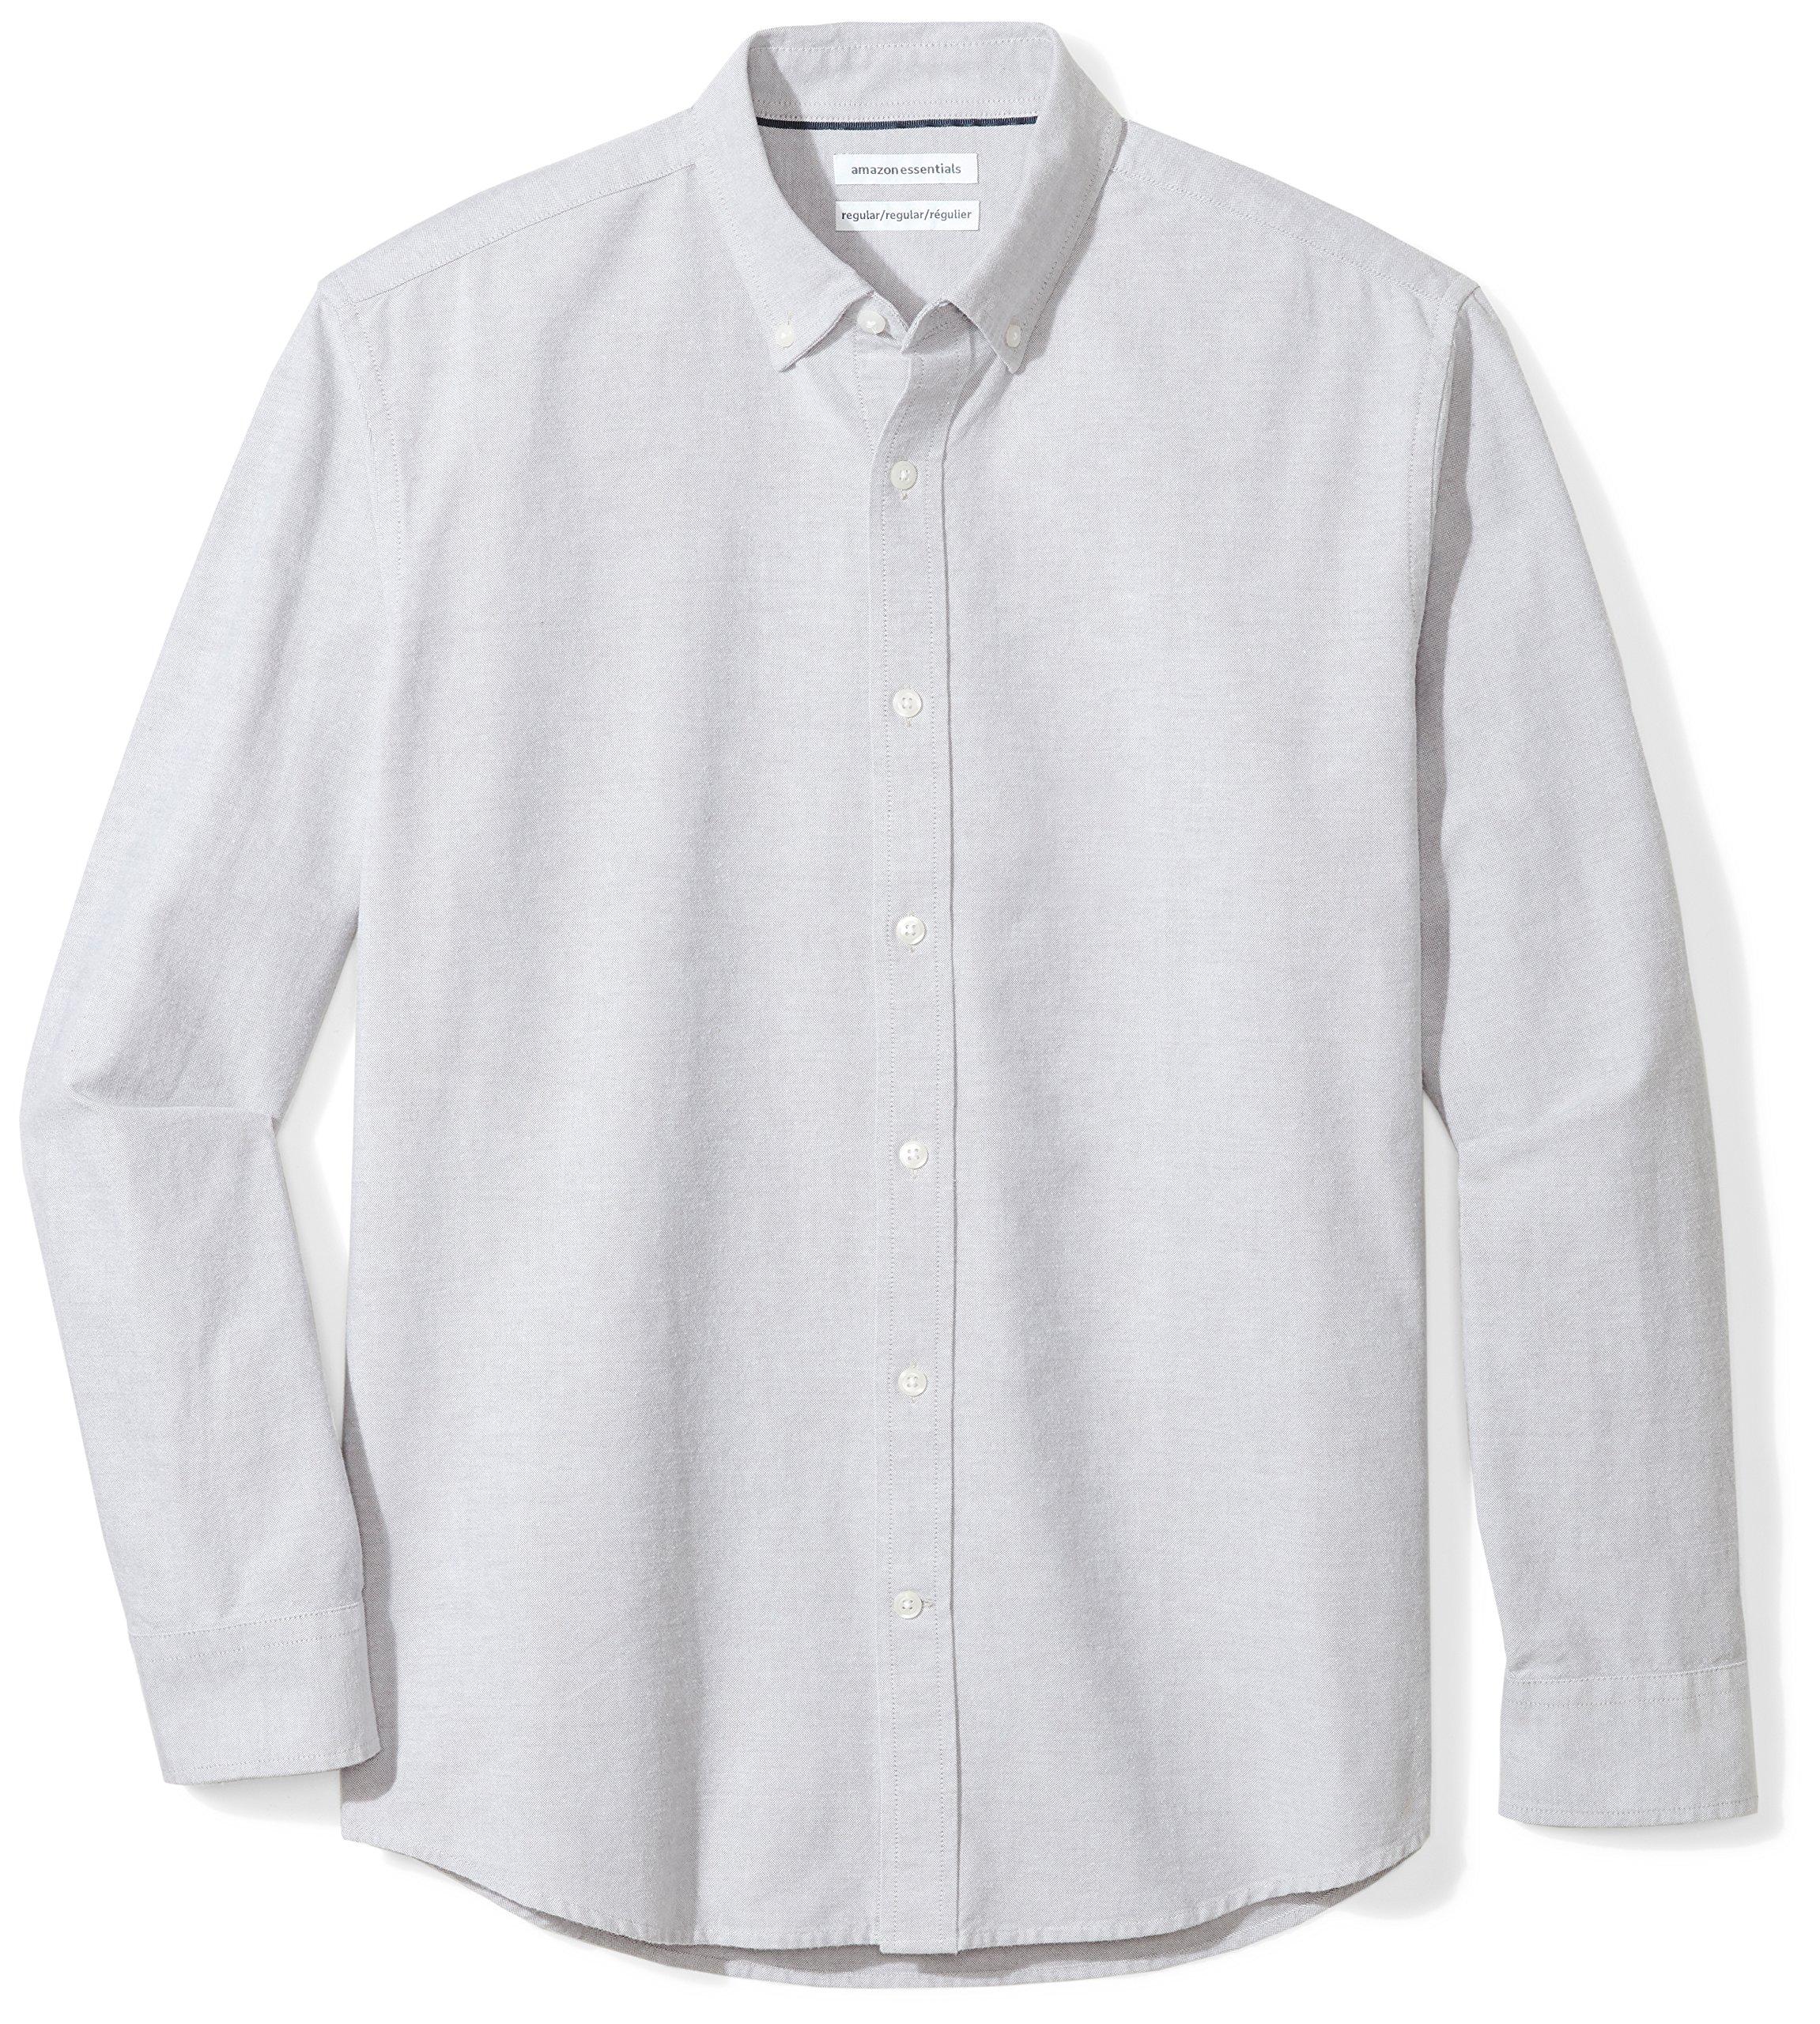 Amazon Essentials Men's Regular-Fit Long-Sleeve Solid Oxford Shirt, grey, X-Large